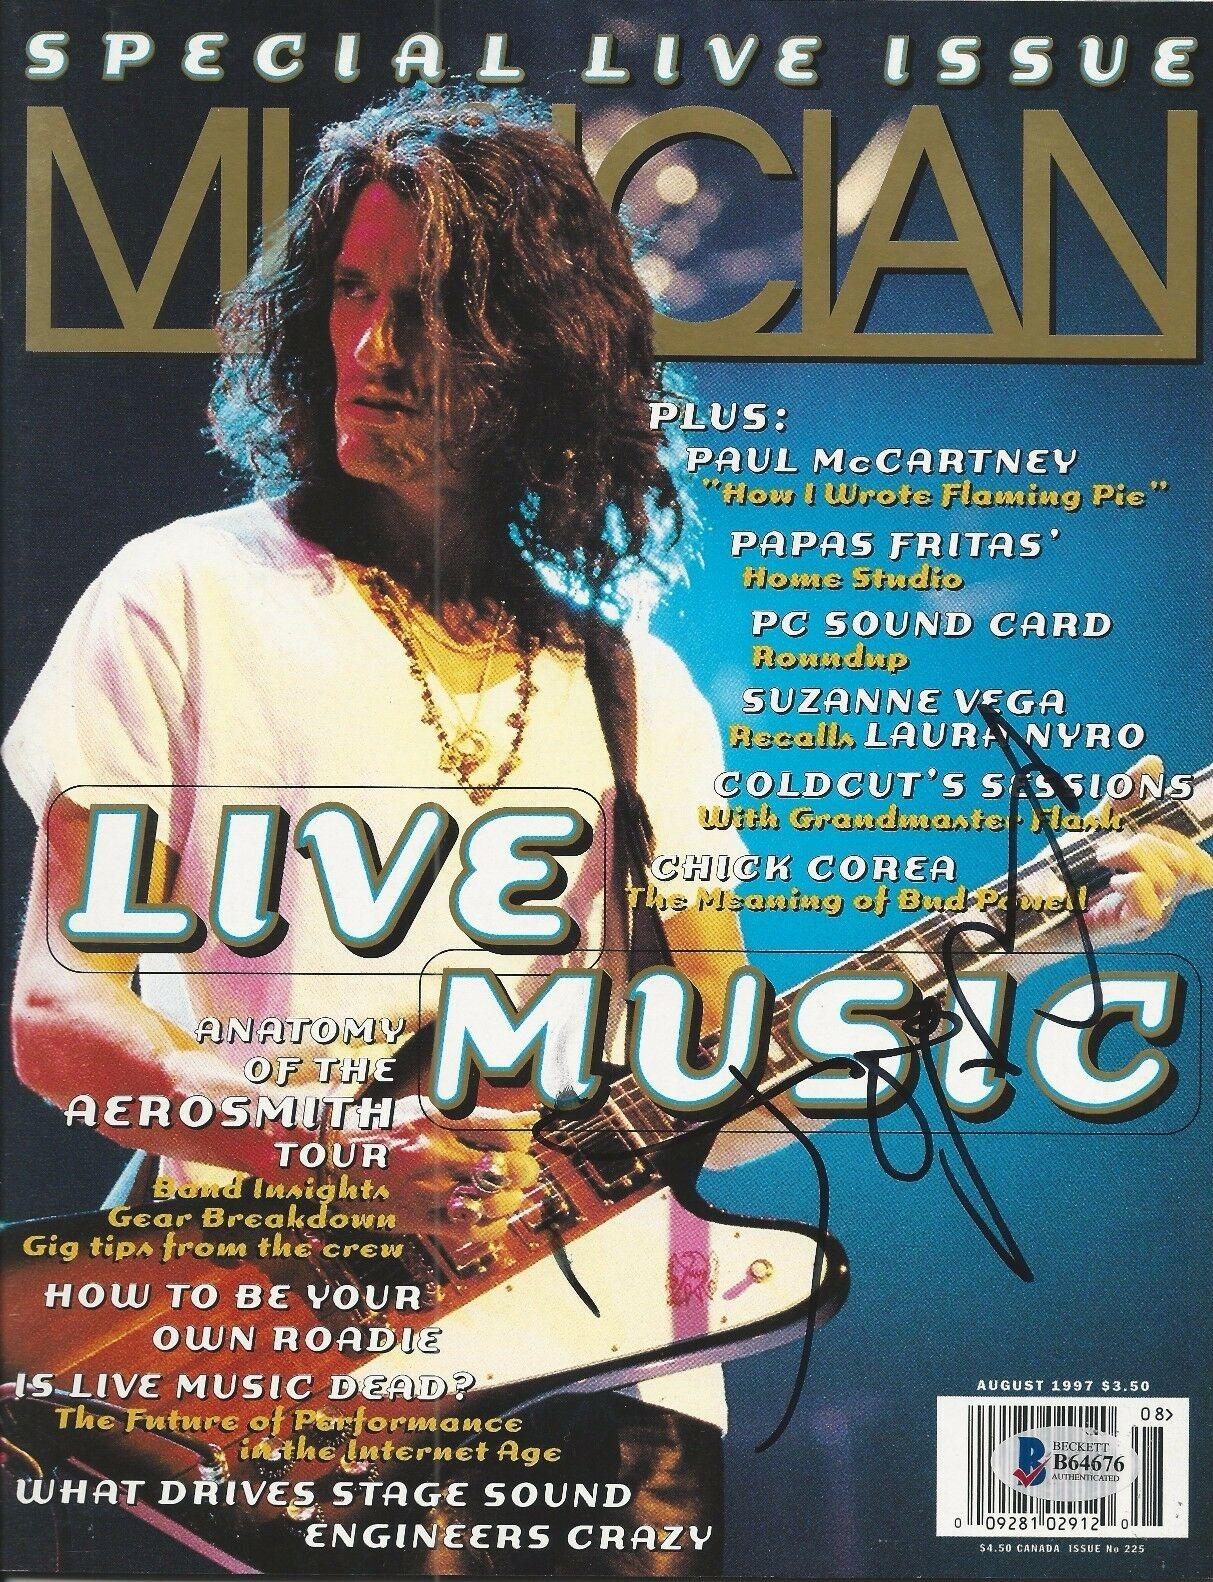 JOE PERRY (Aerosmith) Signed MUSICIAN Magazine with Beckett COA - NO LABEL